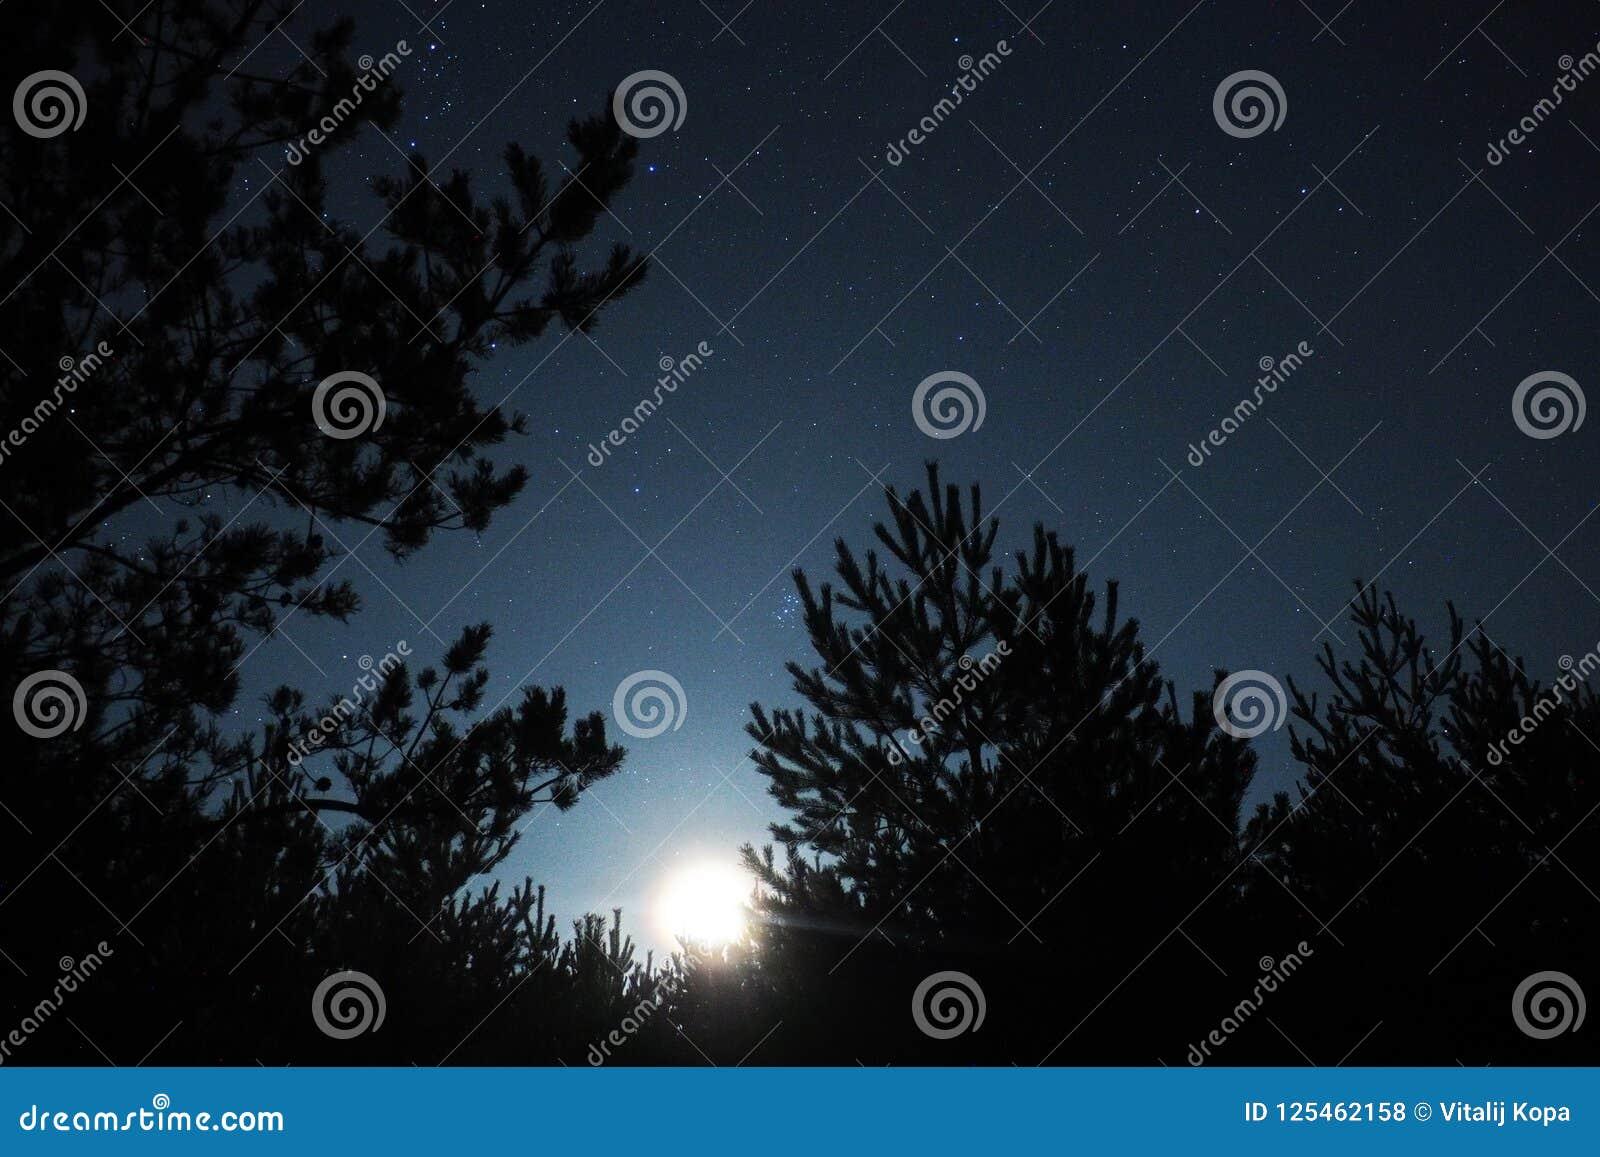 Night sky stars, Moon light and Pleiades observing